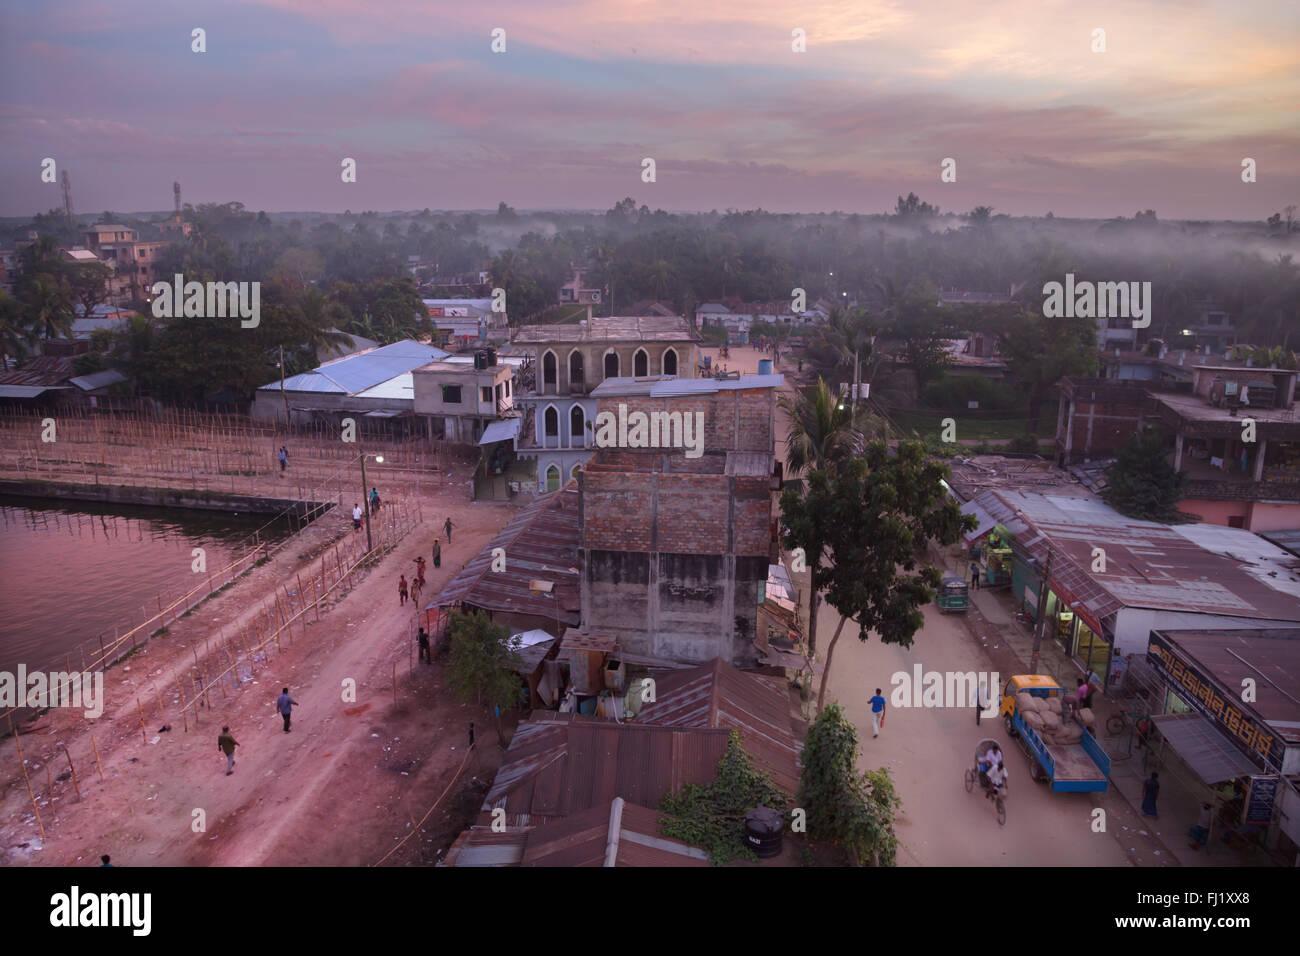 Sunset in Sreemangal , Bangladesh - Stock Image